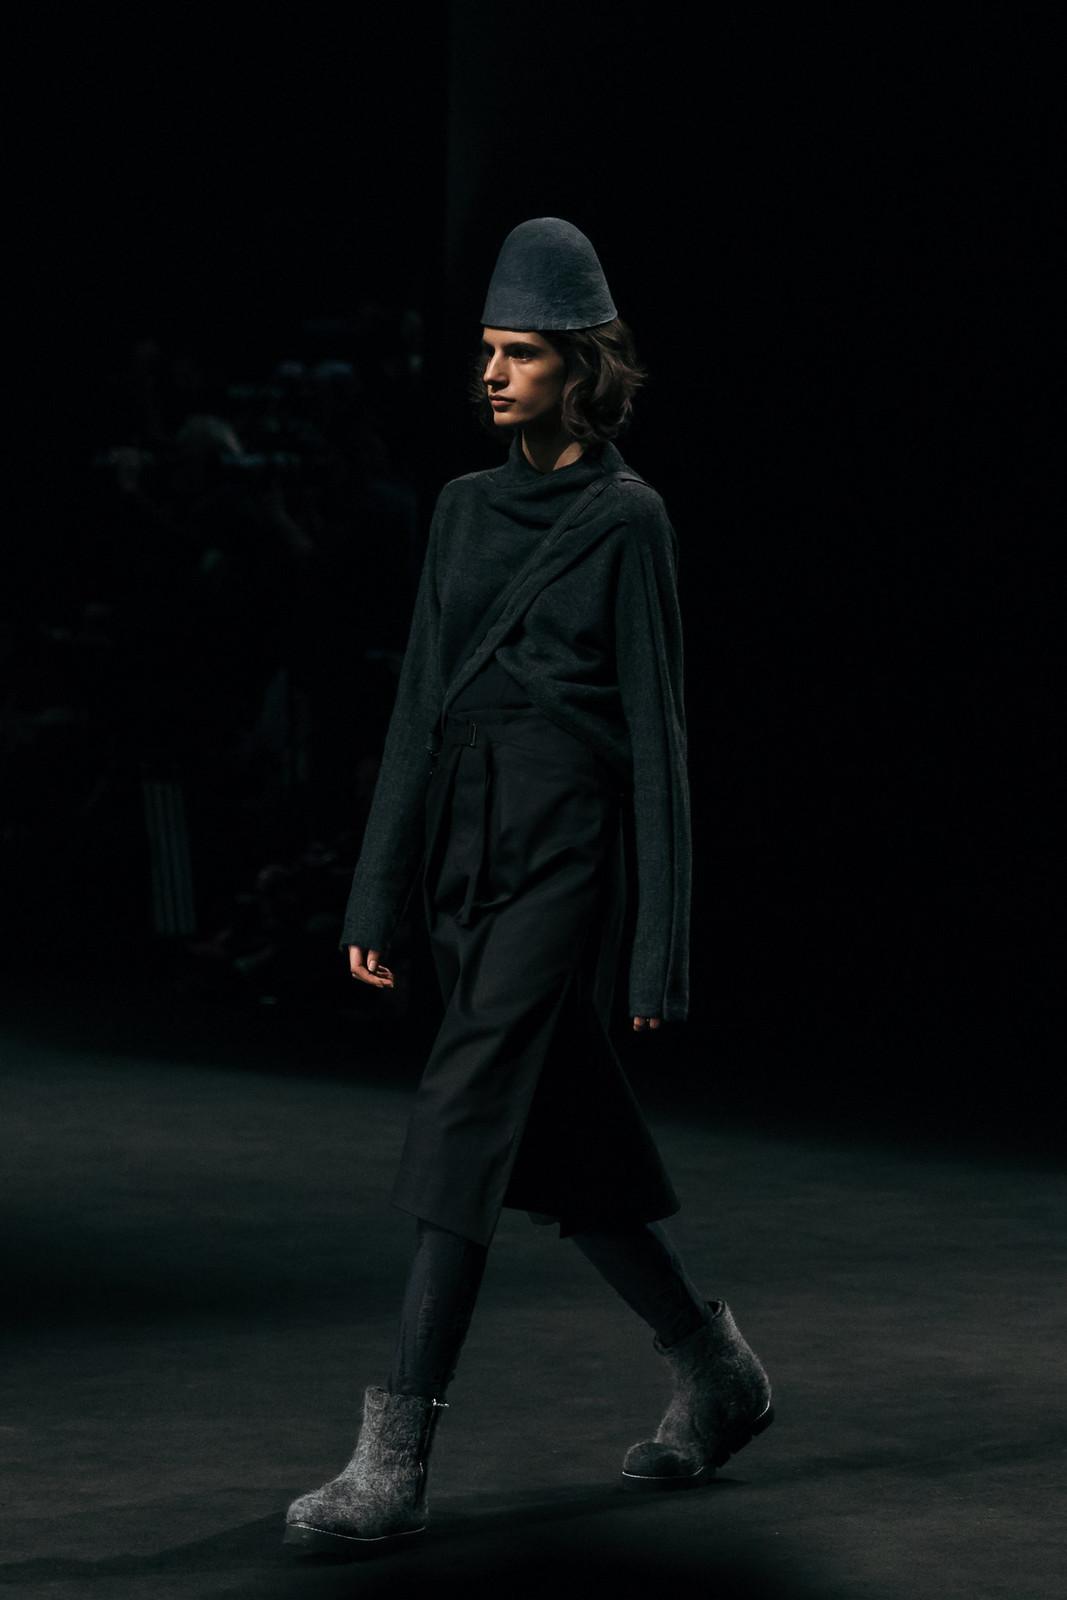 Jessie Chanes - Seams for a desire - 080 Bacelona Fashion #080bcnfasion -27